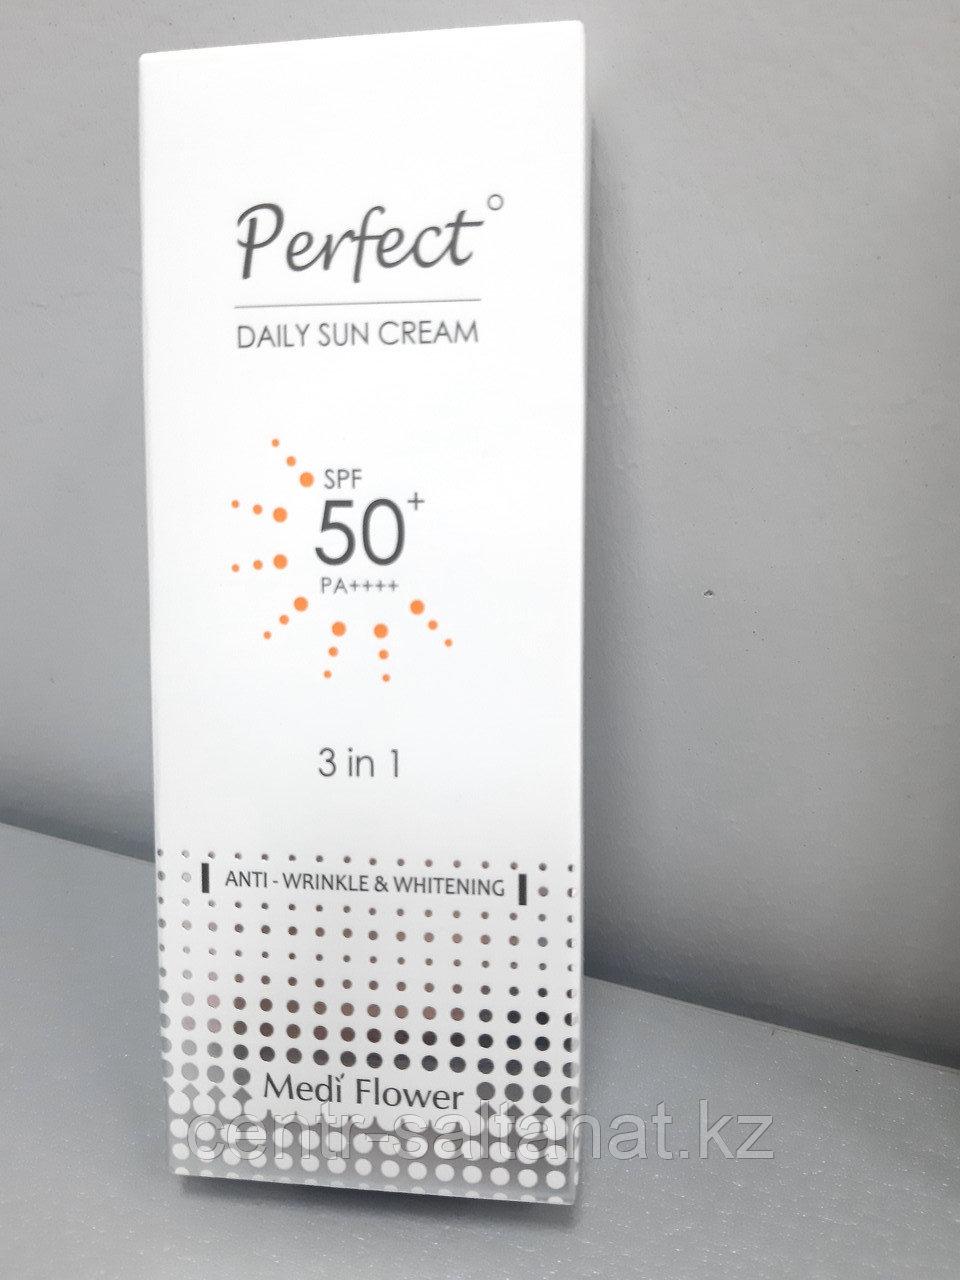 Солнцезащитный крем Perfect Daily Sun Cream 3 in 1  SPF 50+ PA++++ 50 мл